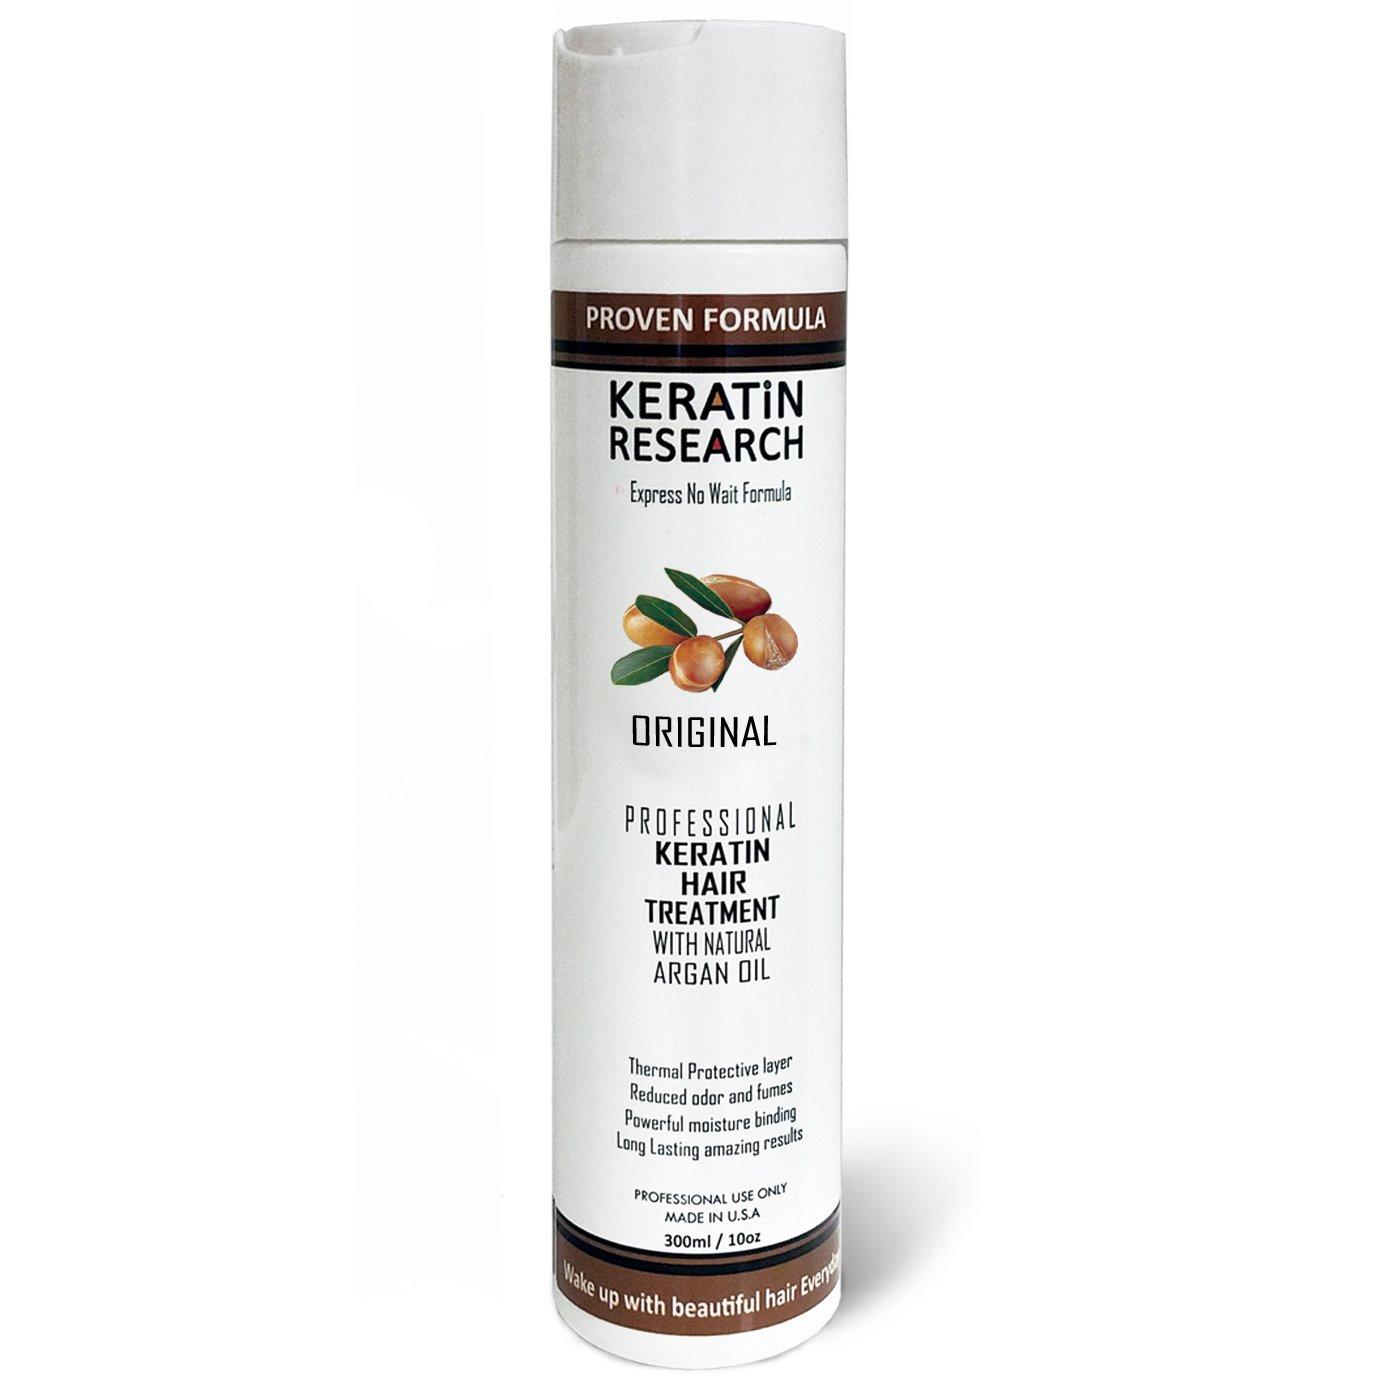 Brazilian Keratin Hair Treatment 300ml Professional Complex Blowout with Argan Oil Improved Formula and Fragrance Keratin Research Queratina Keratina Brasilera Tratamiento